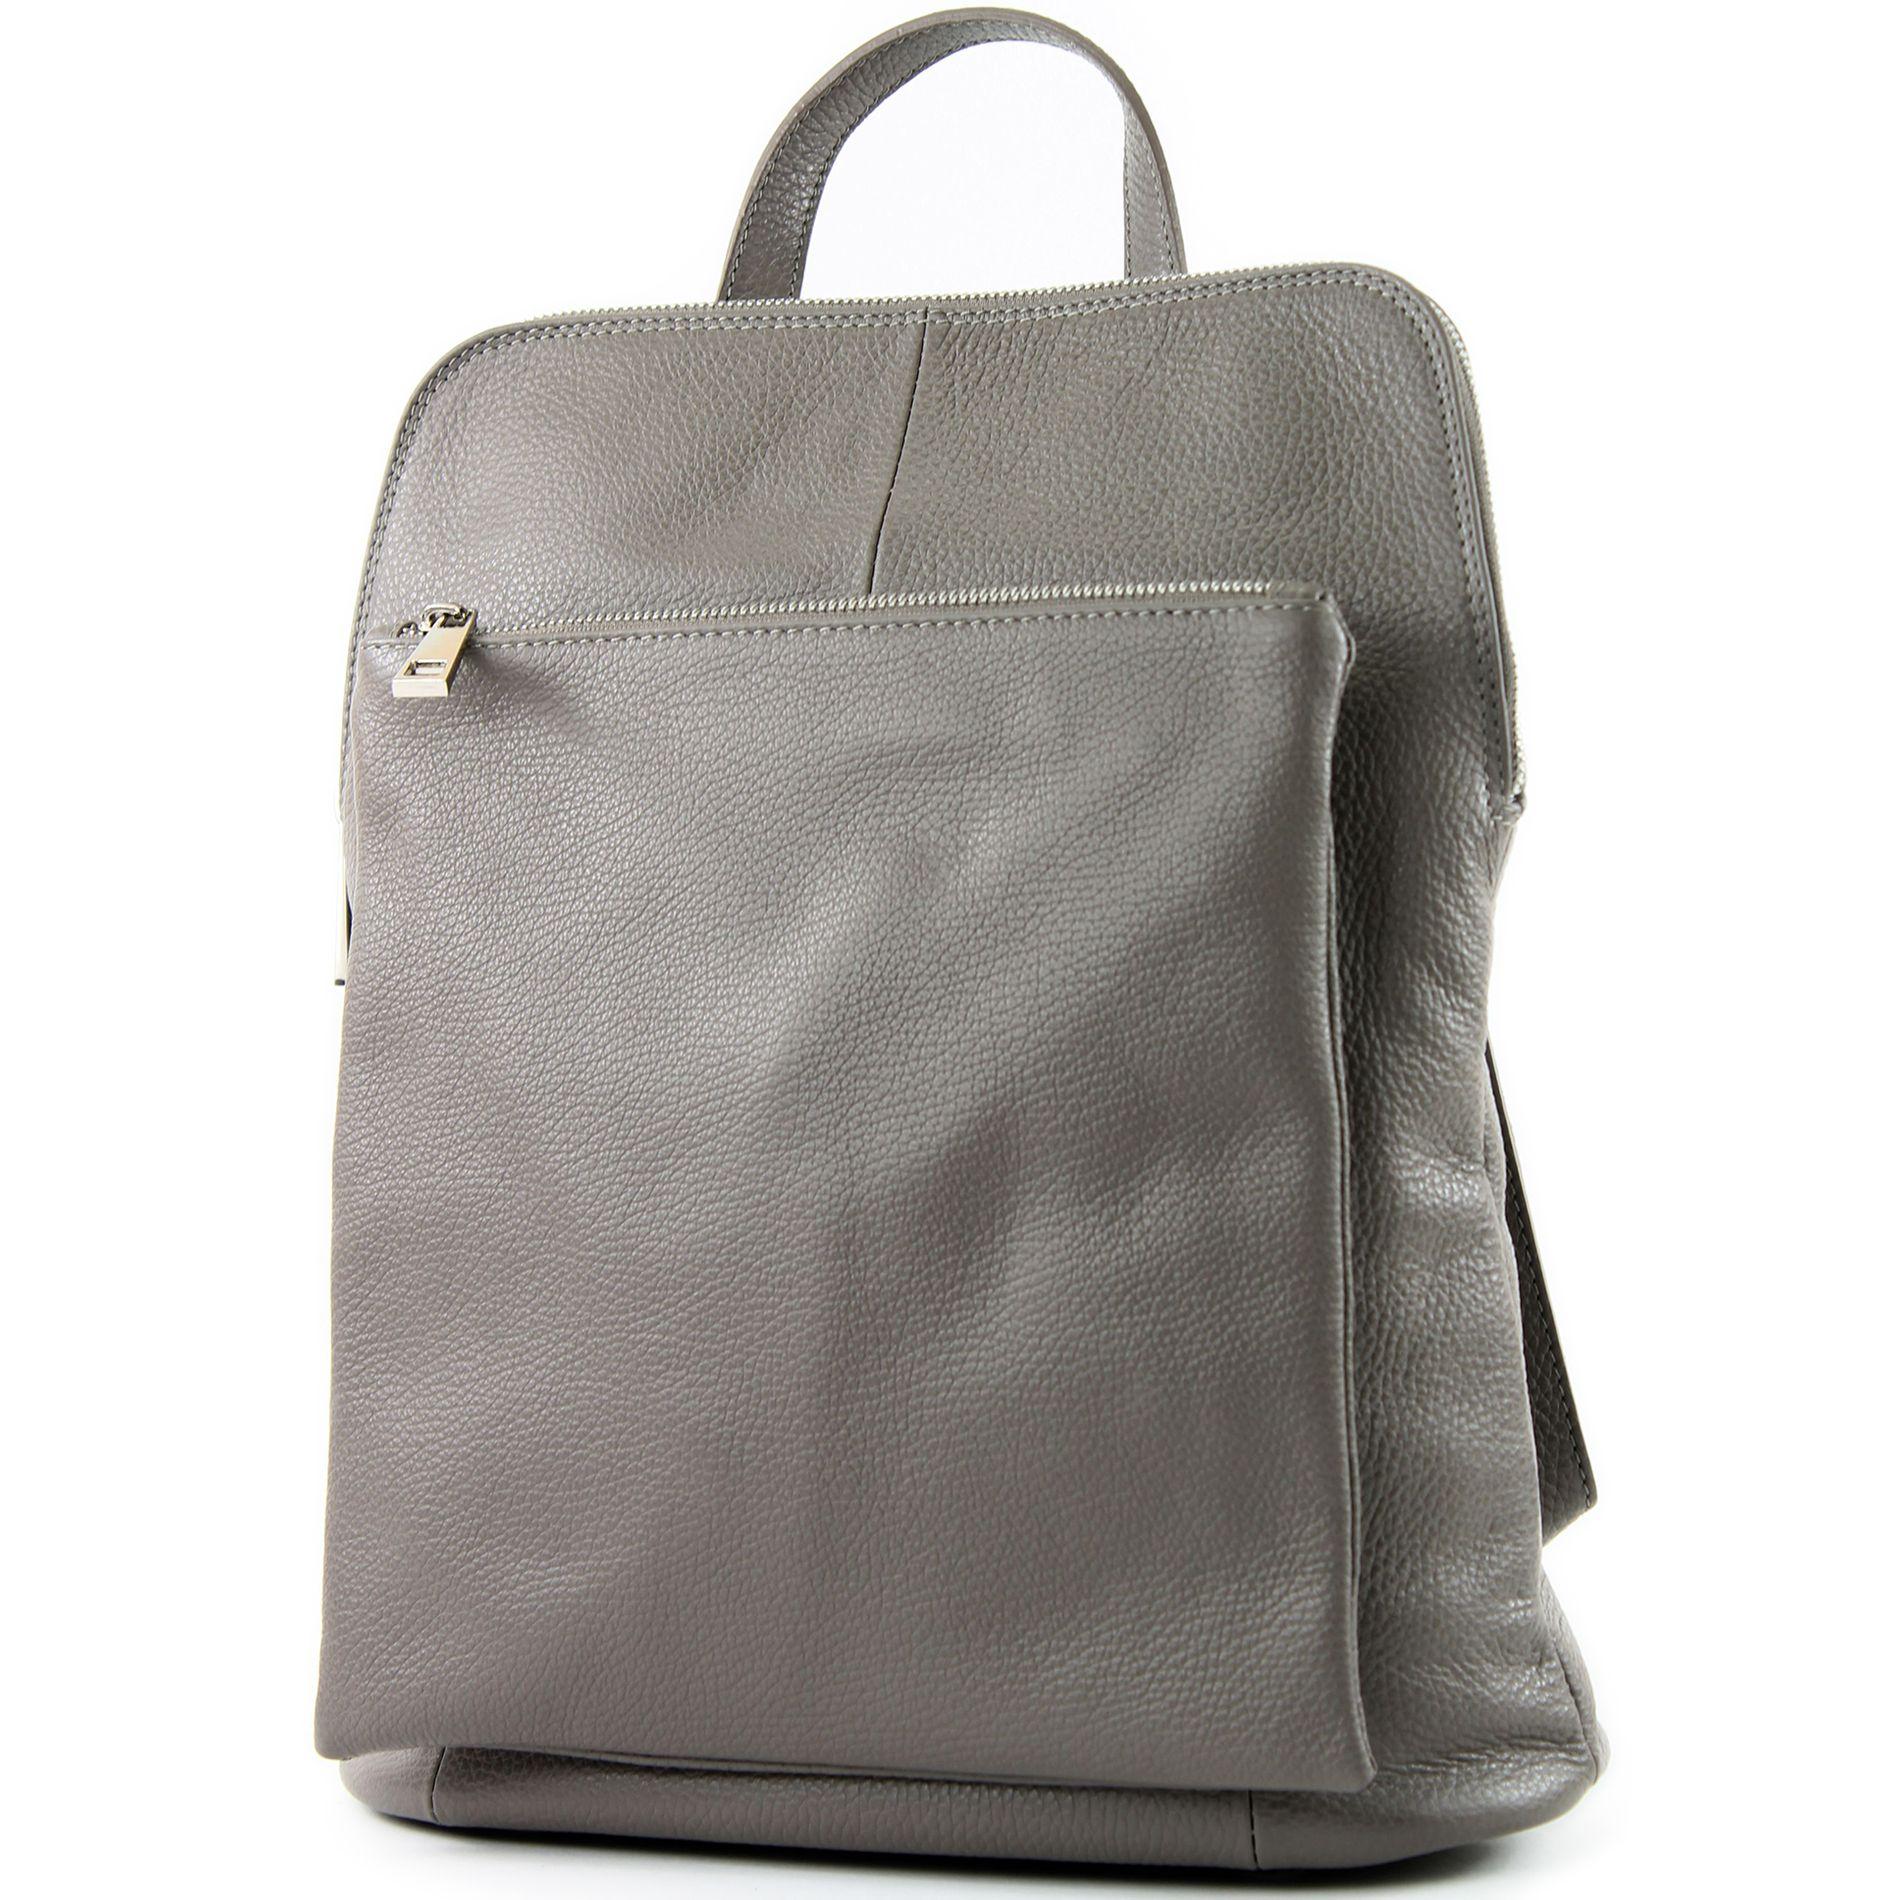 ital lederrucksack damen rucksack rucksacktasche 3in1. Black Bedroom Furniture Sets. Home Design Ideas